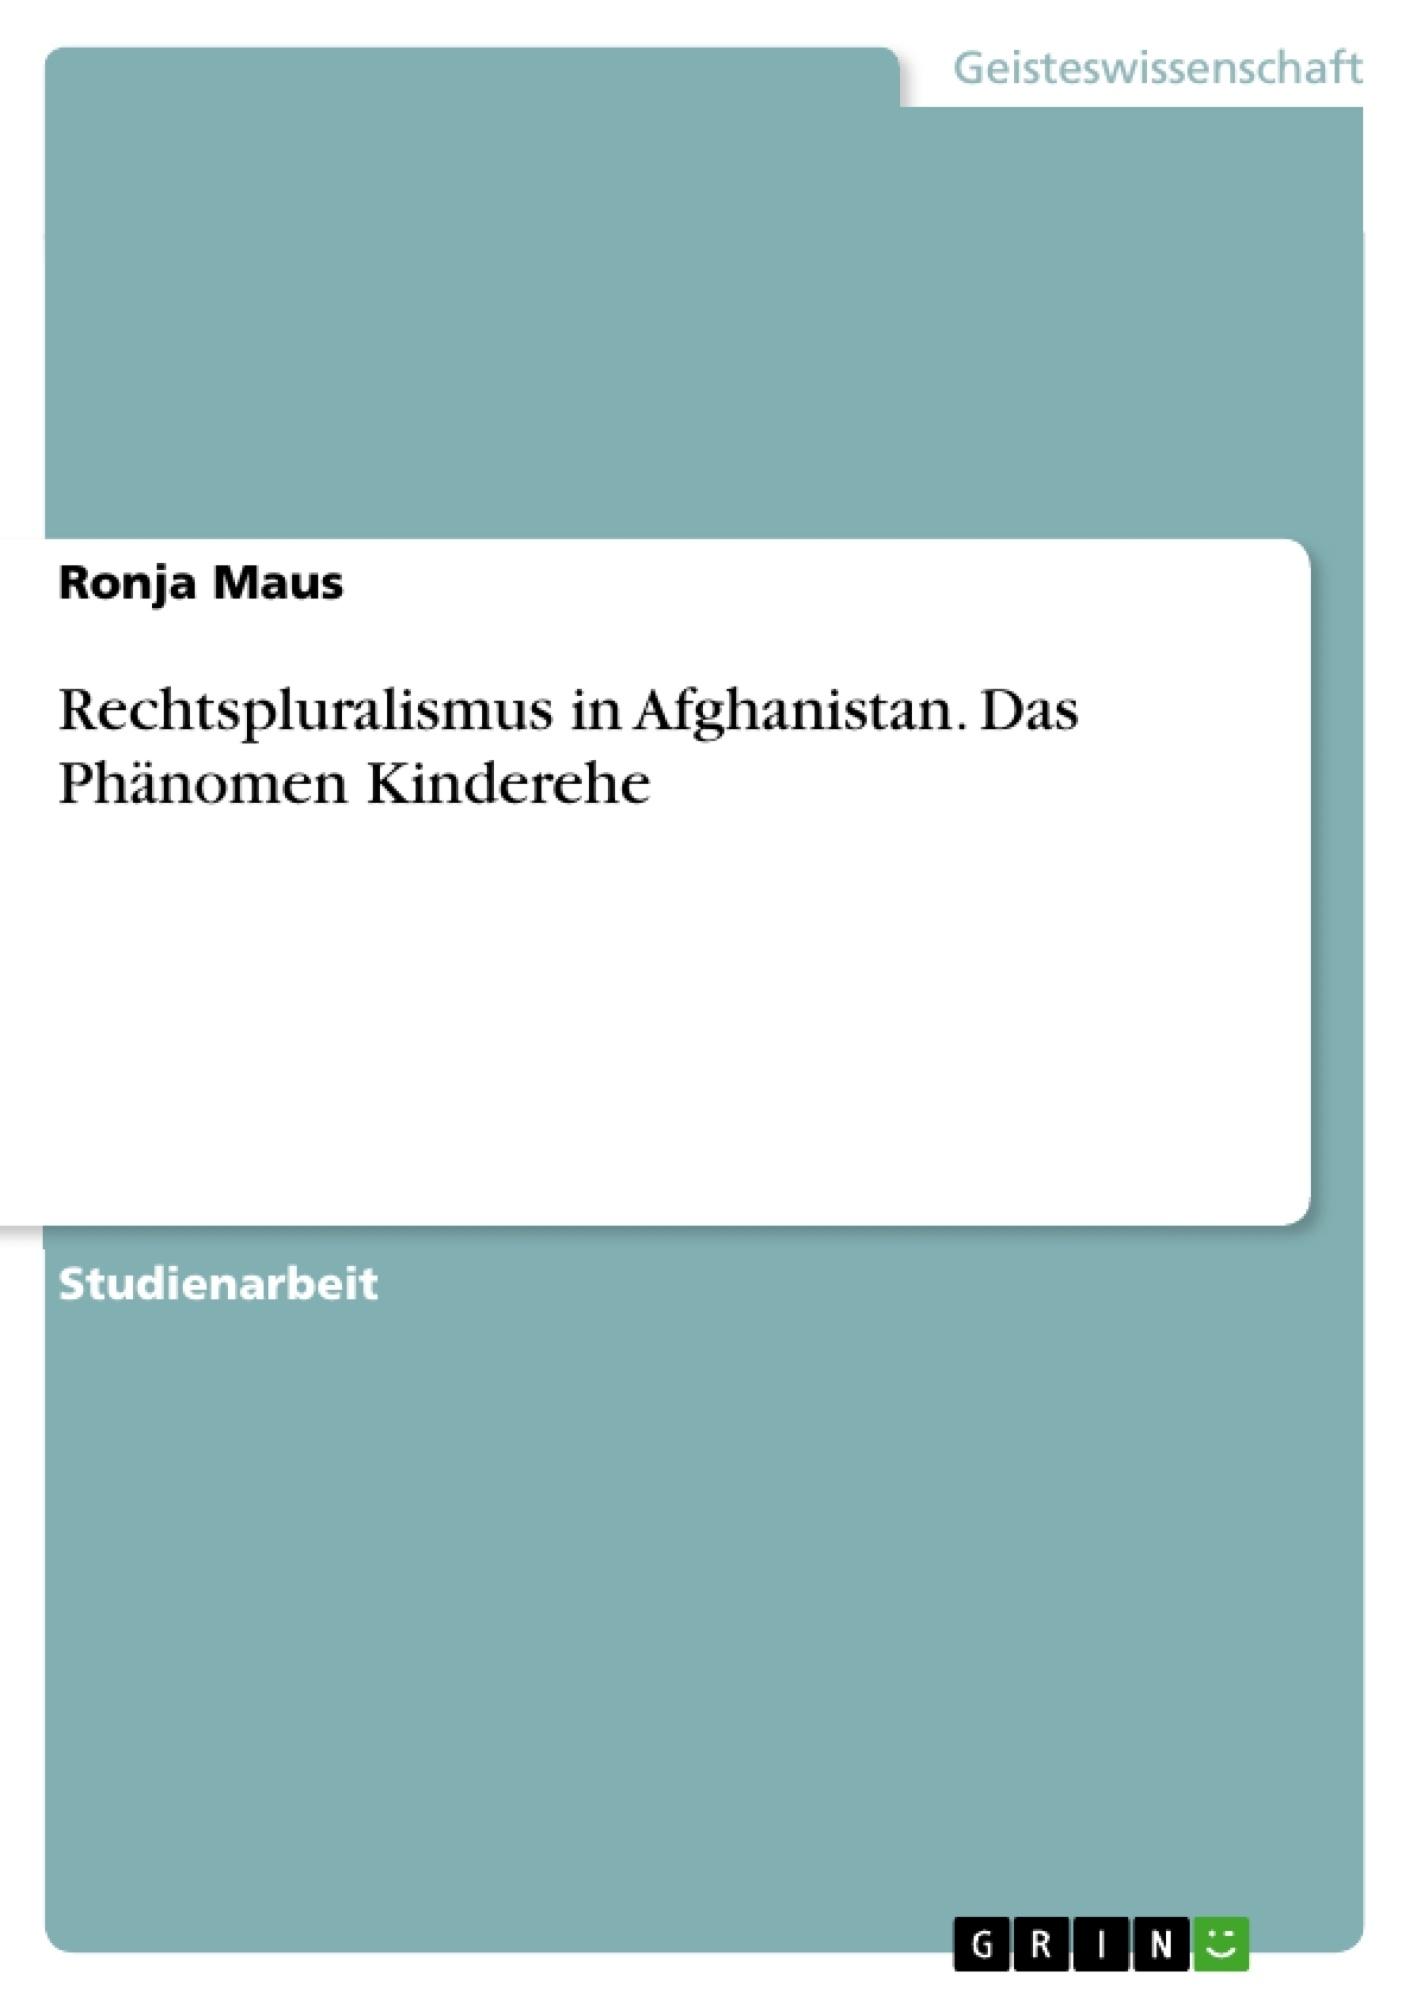 Titel: Rechtspluralismus in Afghanistan. Das Phänomen Kinderehe